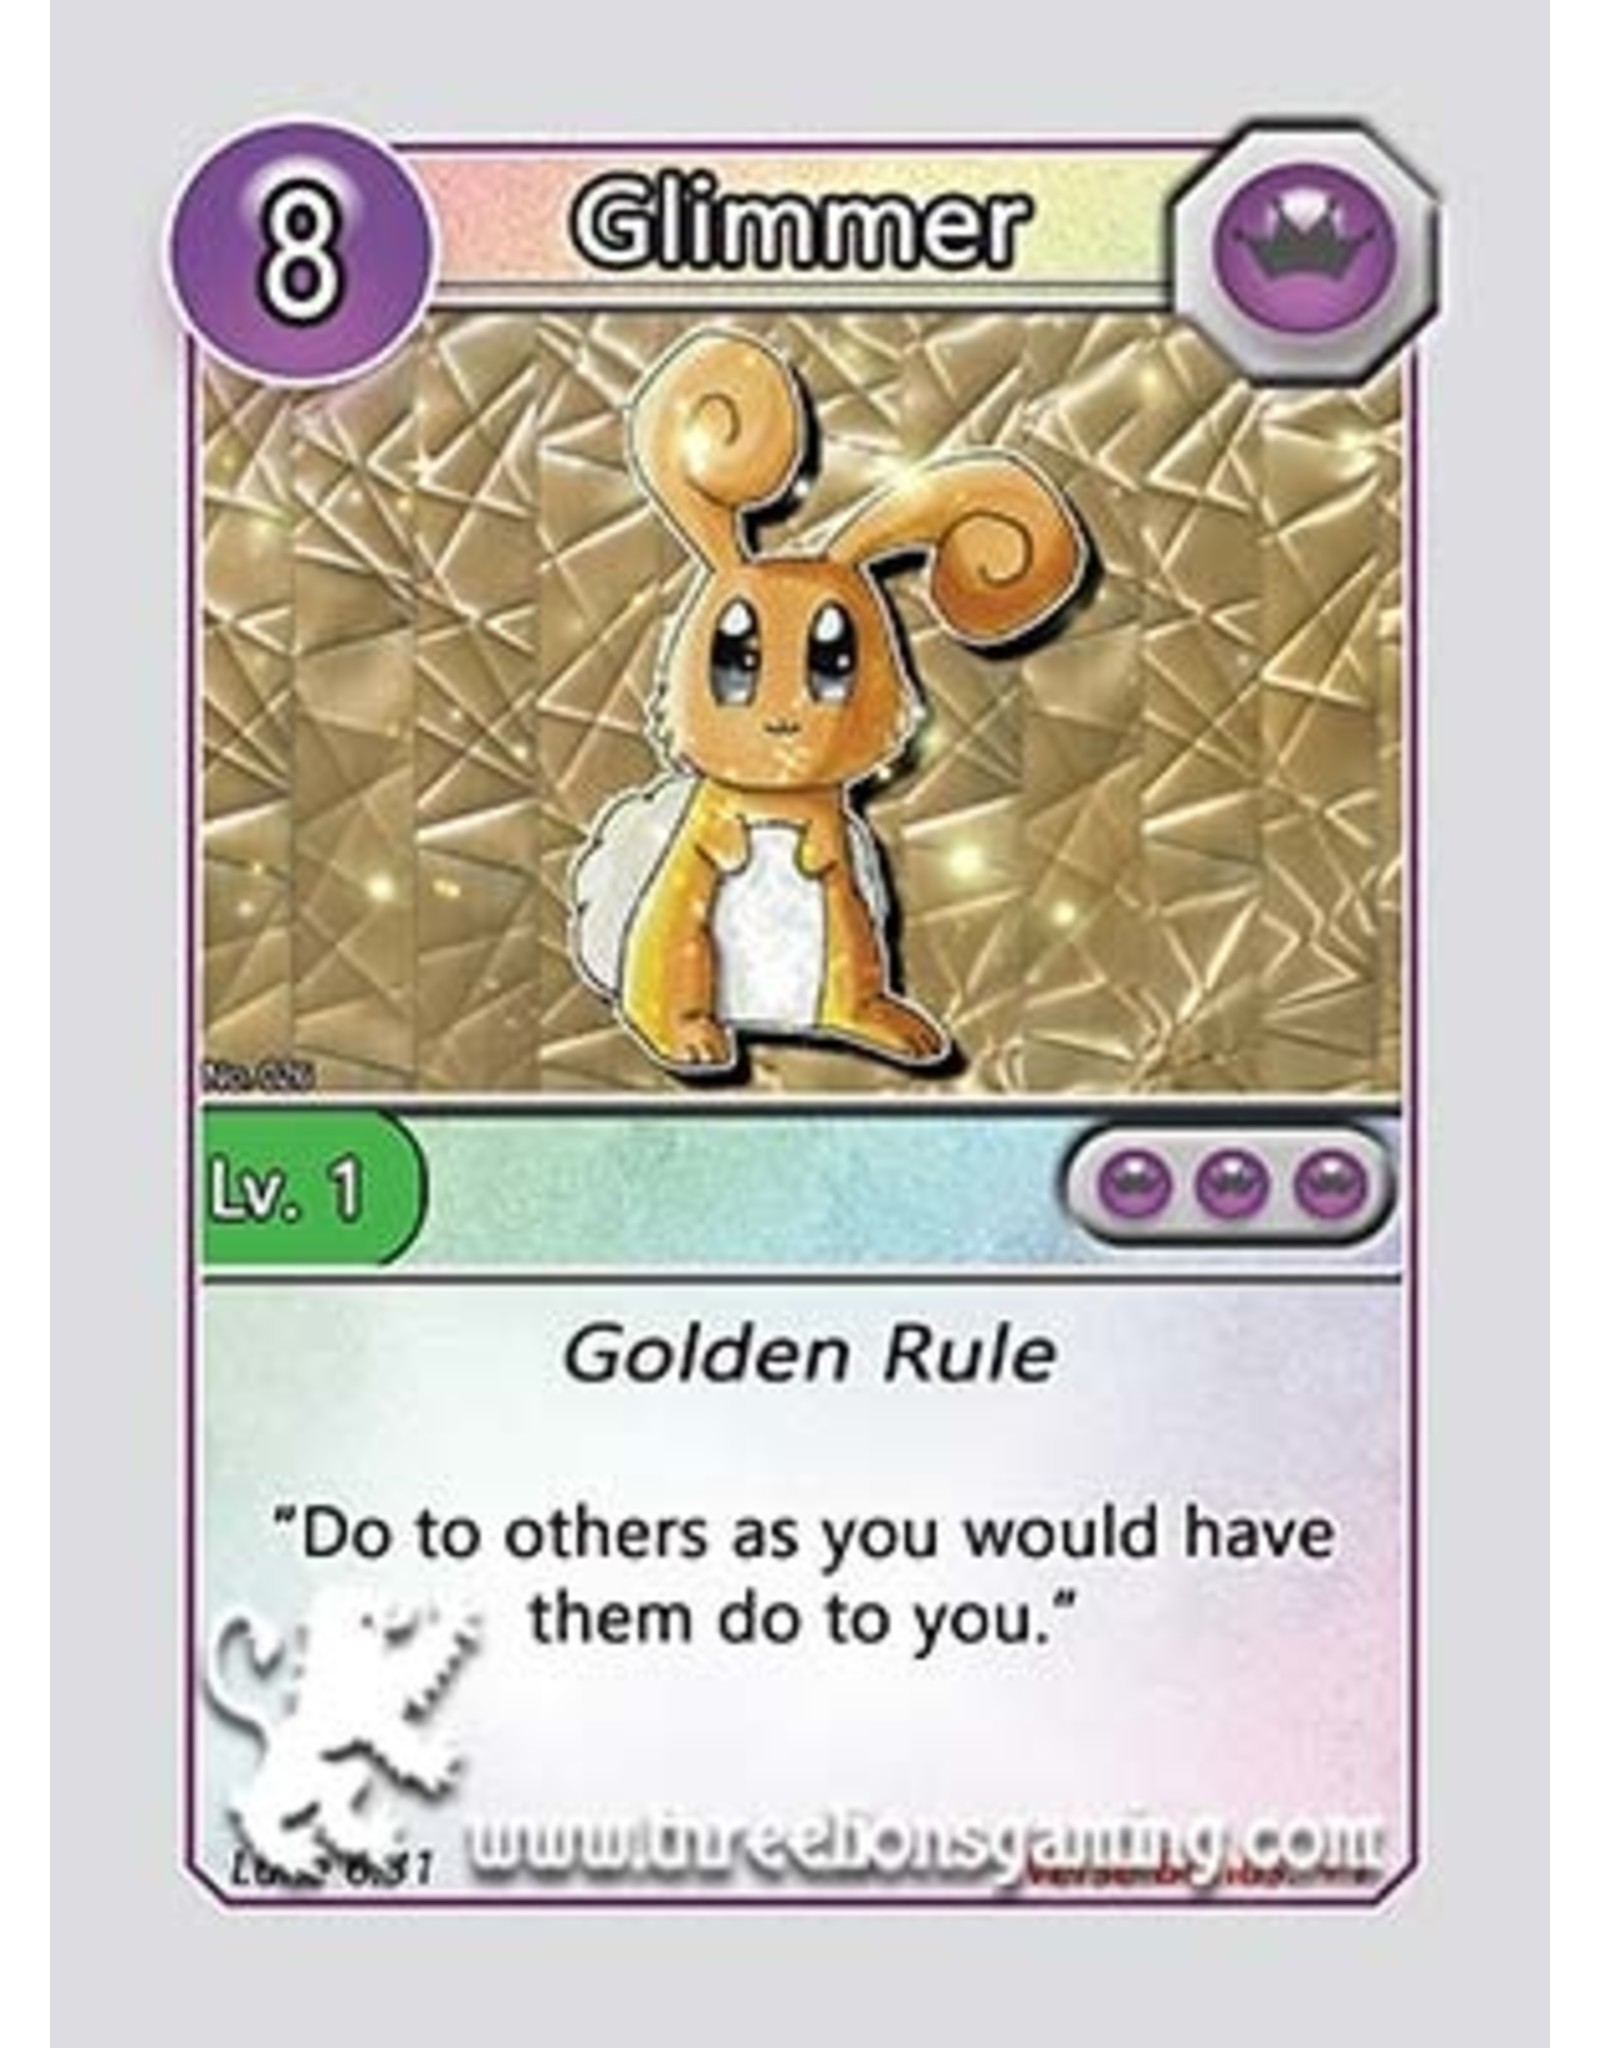 S1: Glimmer